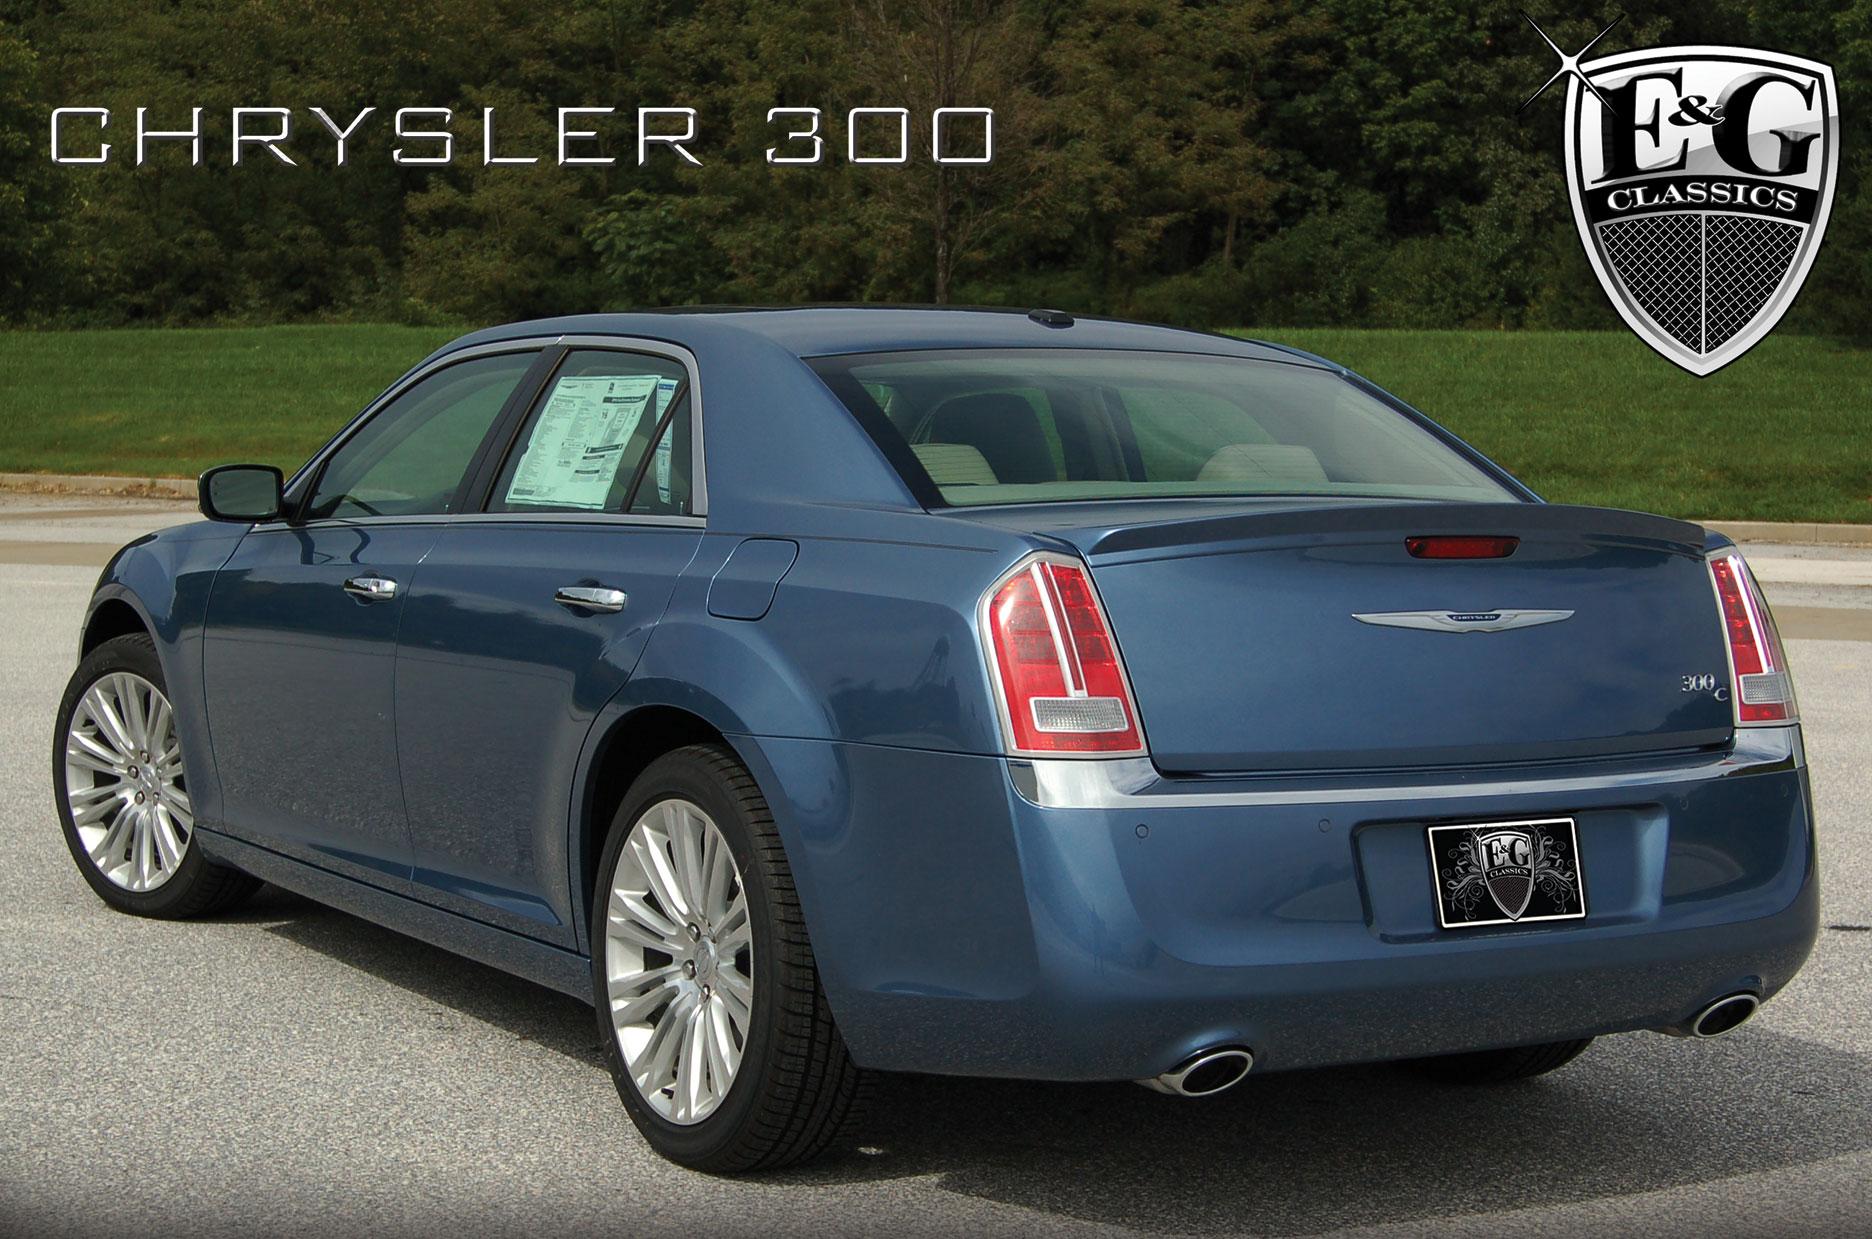 E&G Classics Chrysler 300, 300C, Touring Grilles Wing Body ...